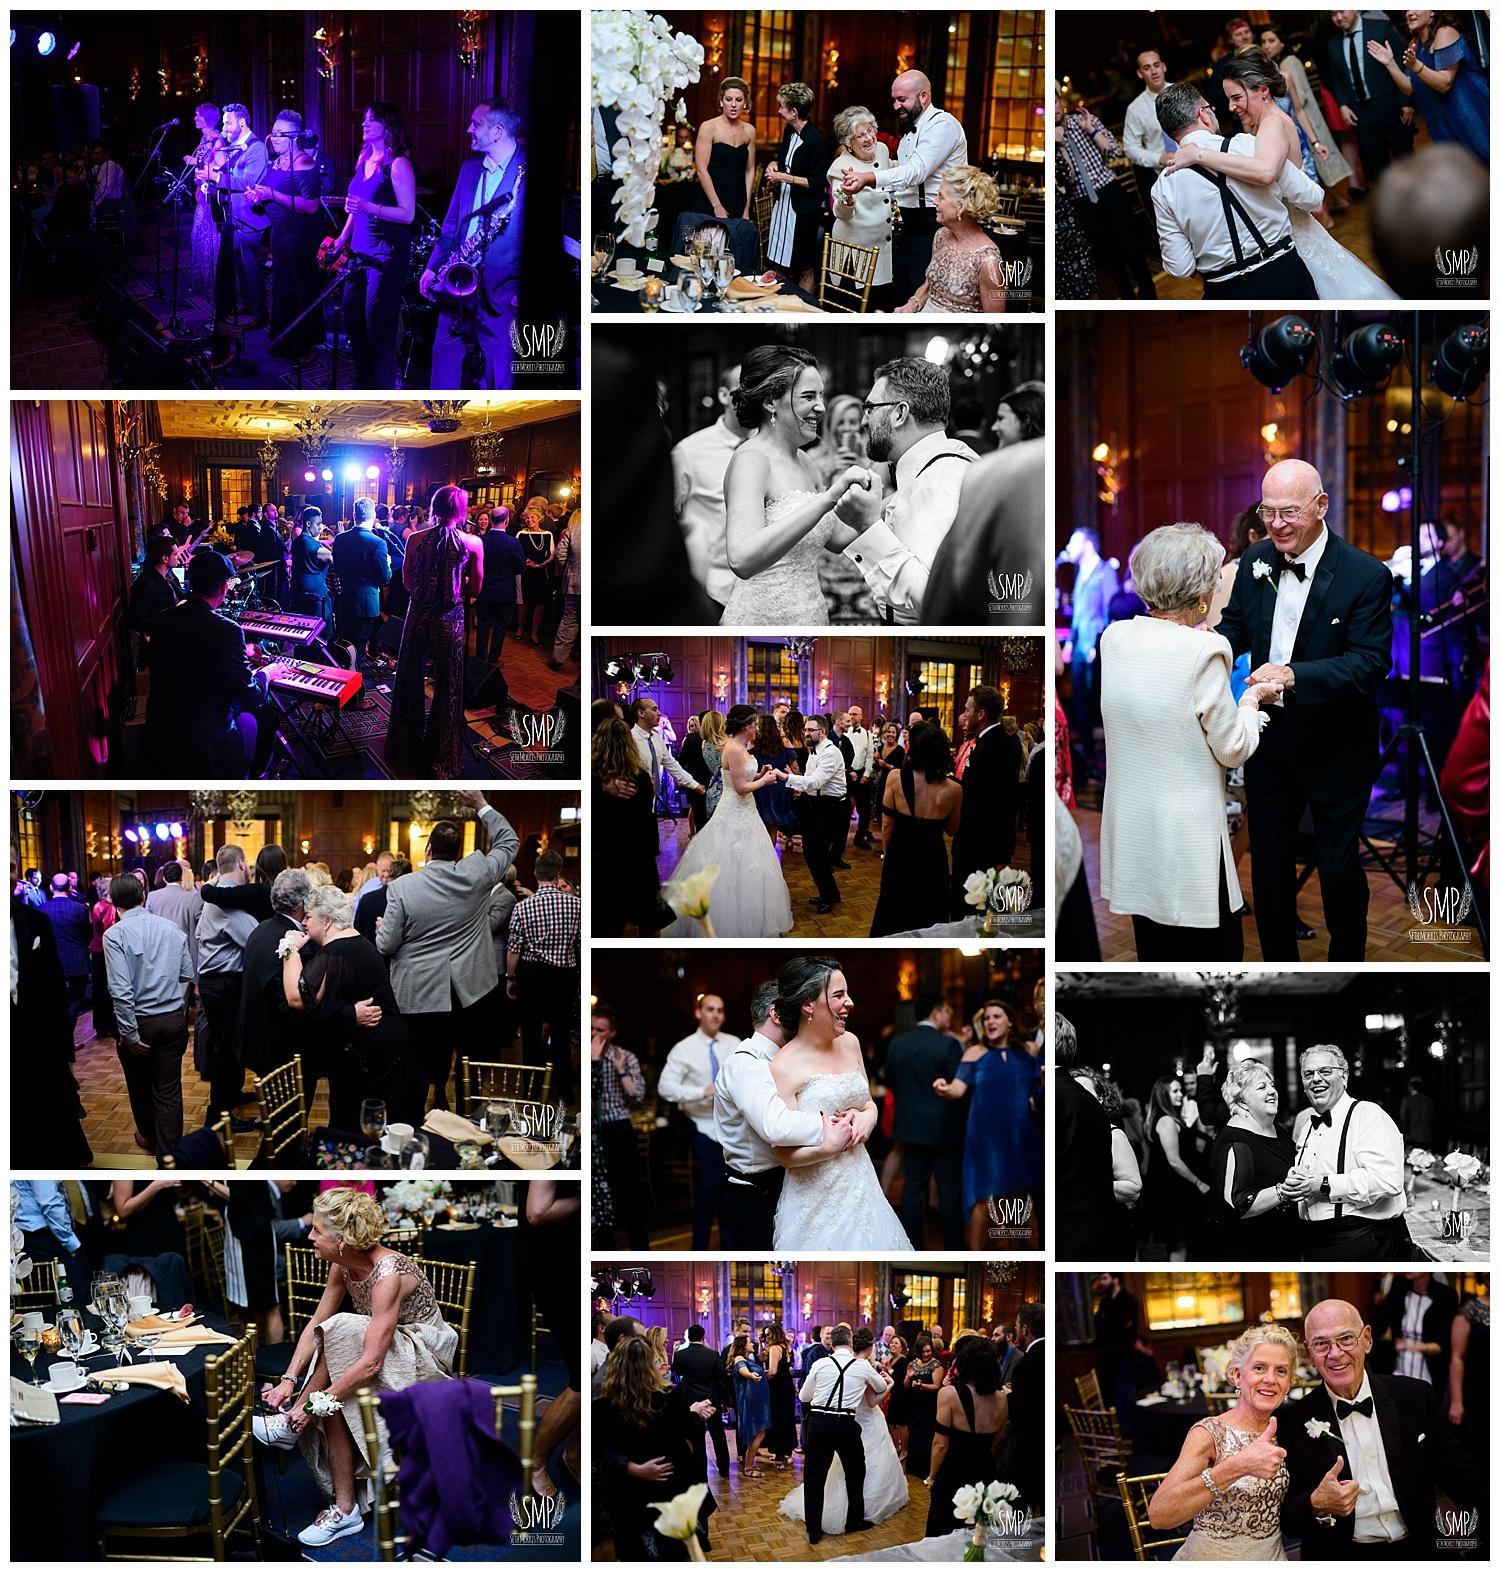 chicago-wedding-pictures-del-strada-hotel-allegro-135.jpg